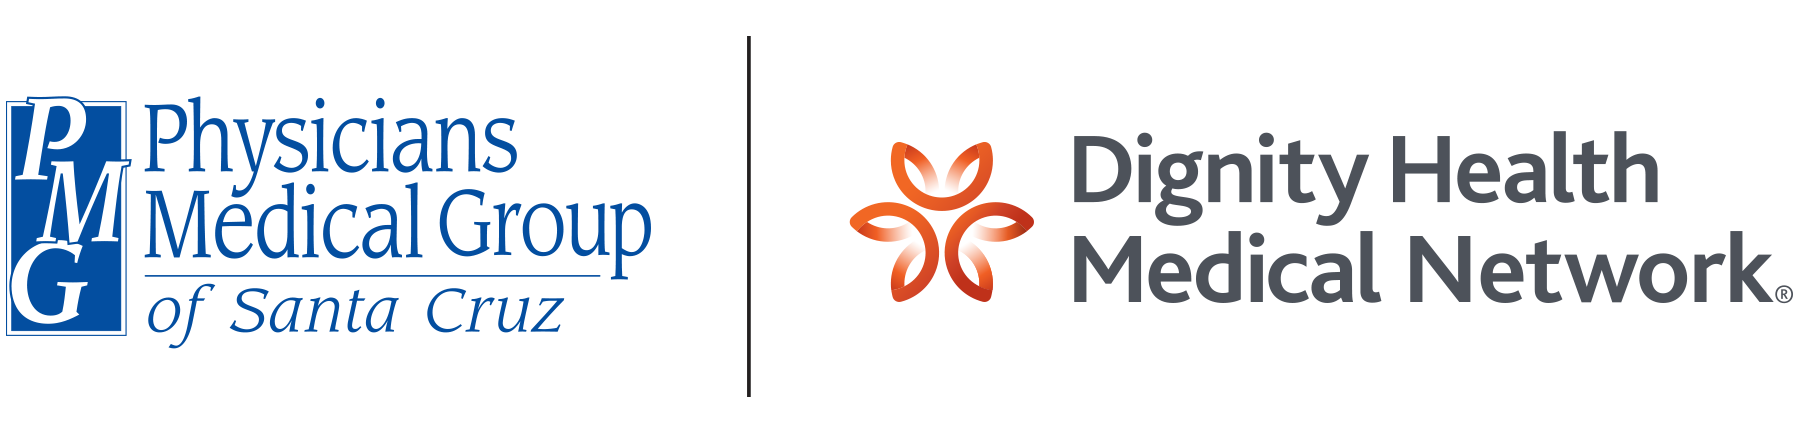 Dignity Health Medical Network - Santa Cruz